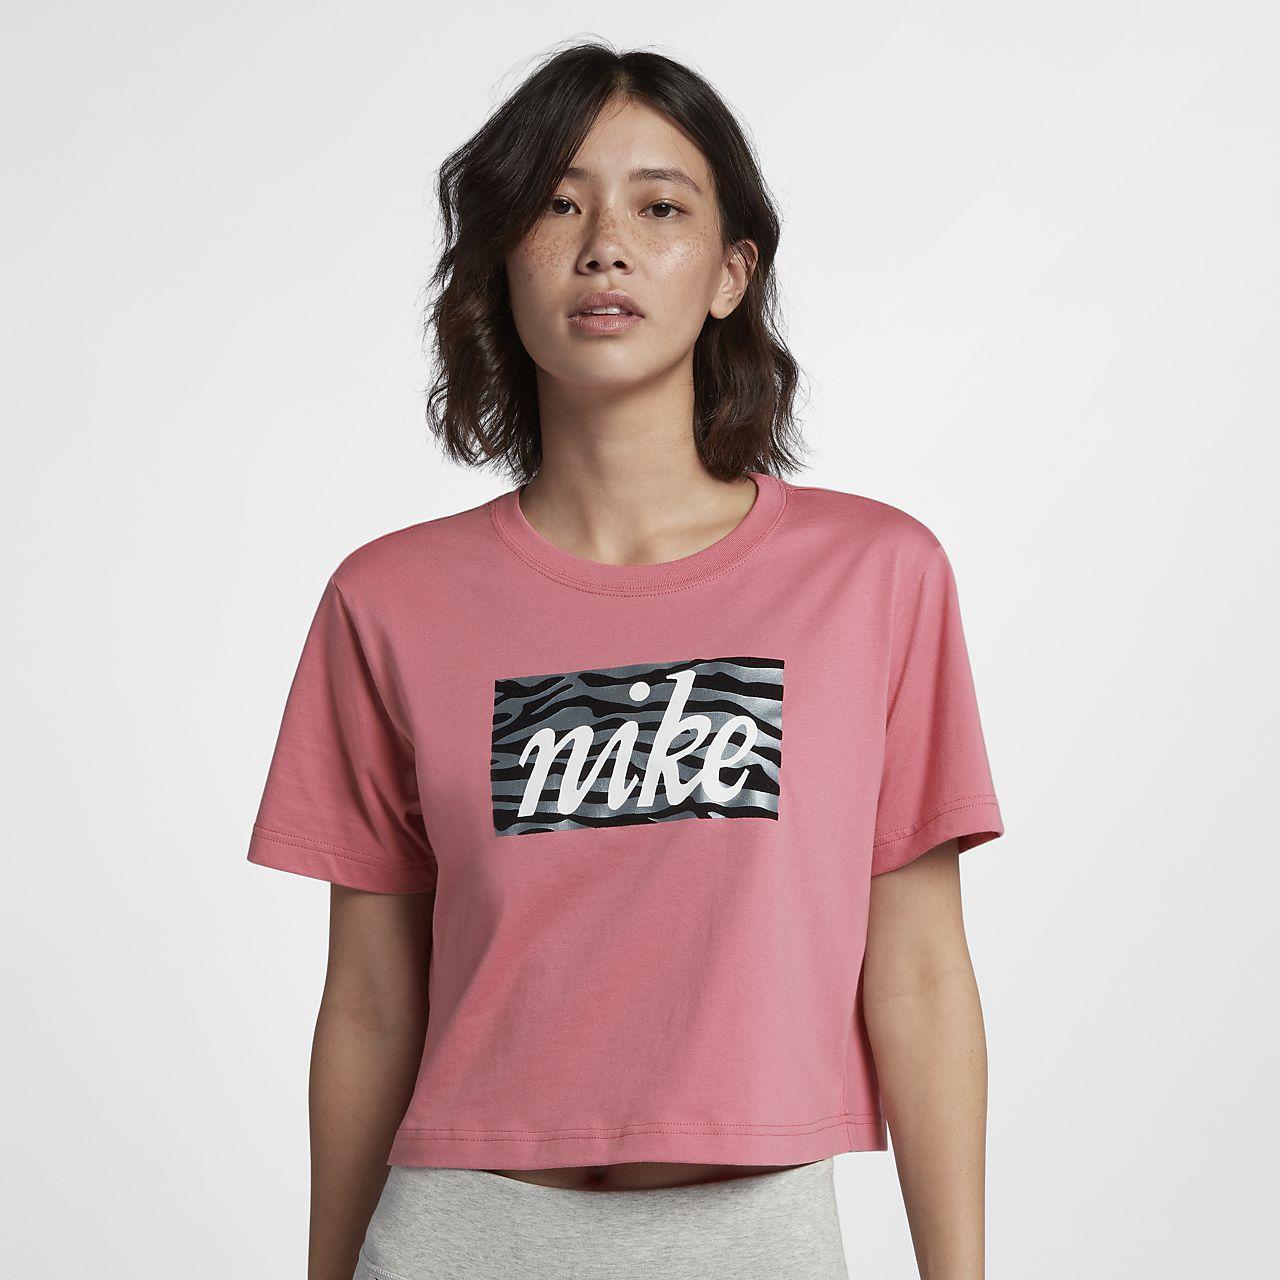 Nike Sportswear rövid ujjú 9df035a555